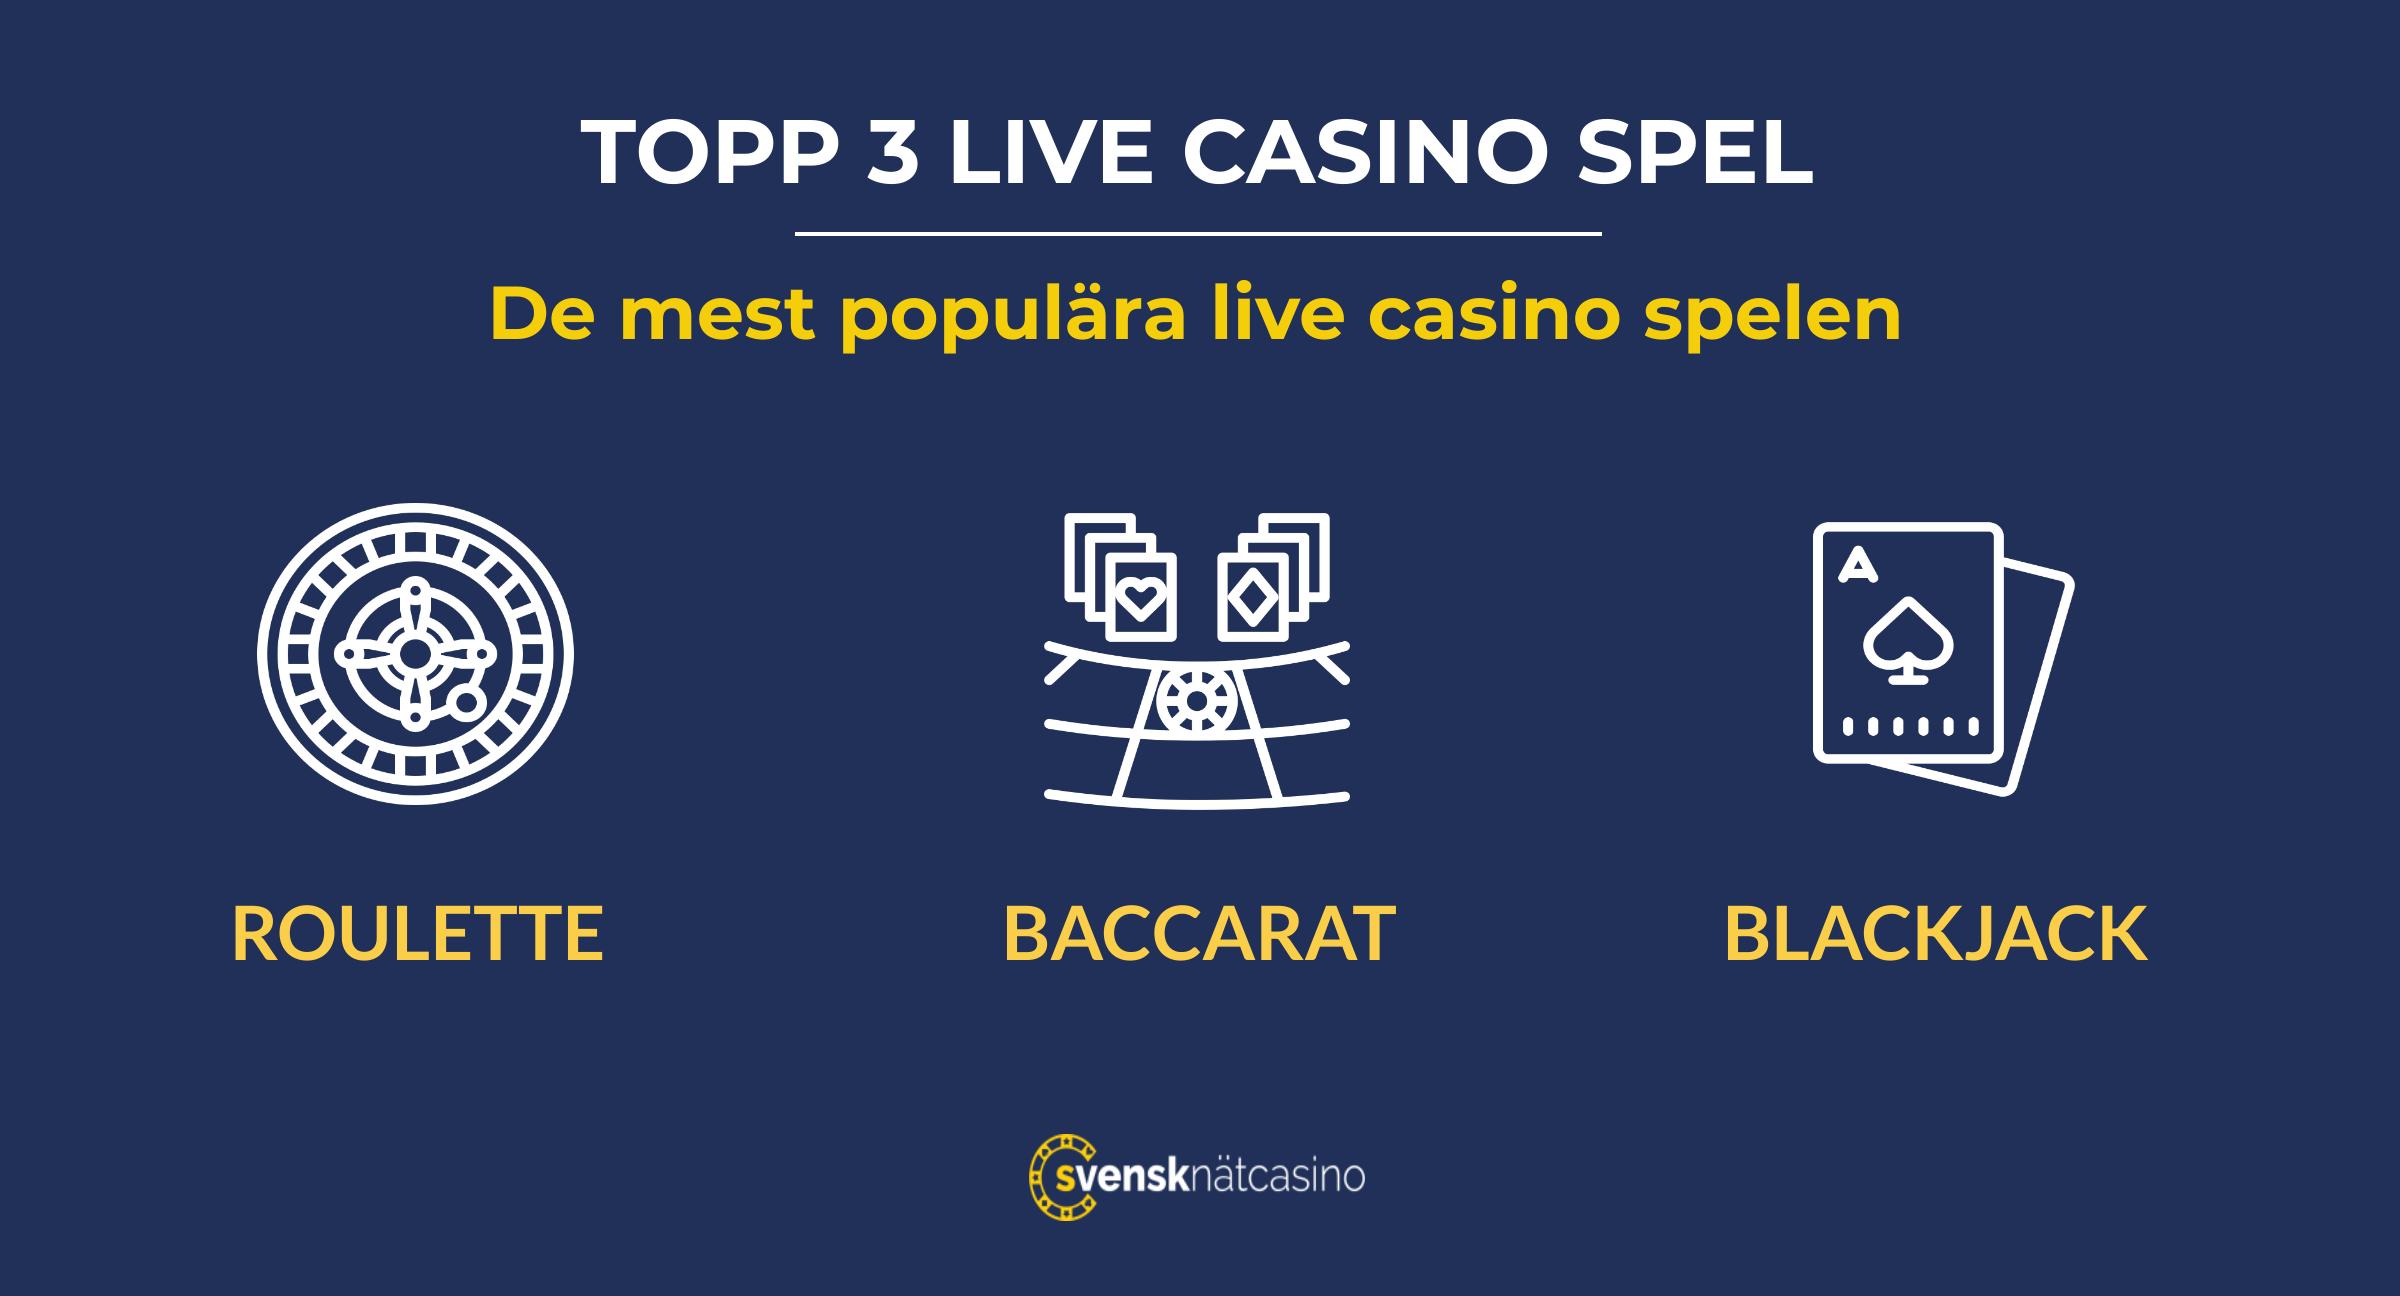 bast live casino spel svensknatcasino